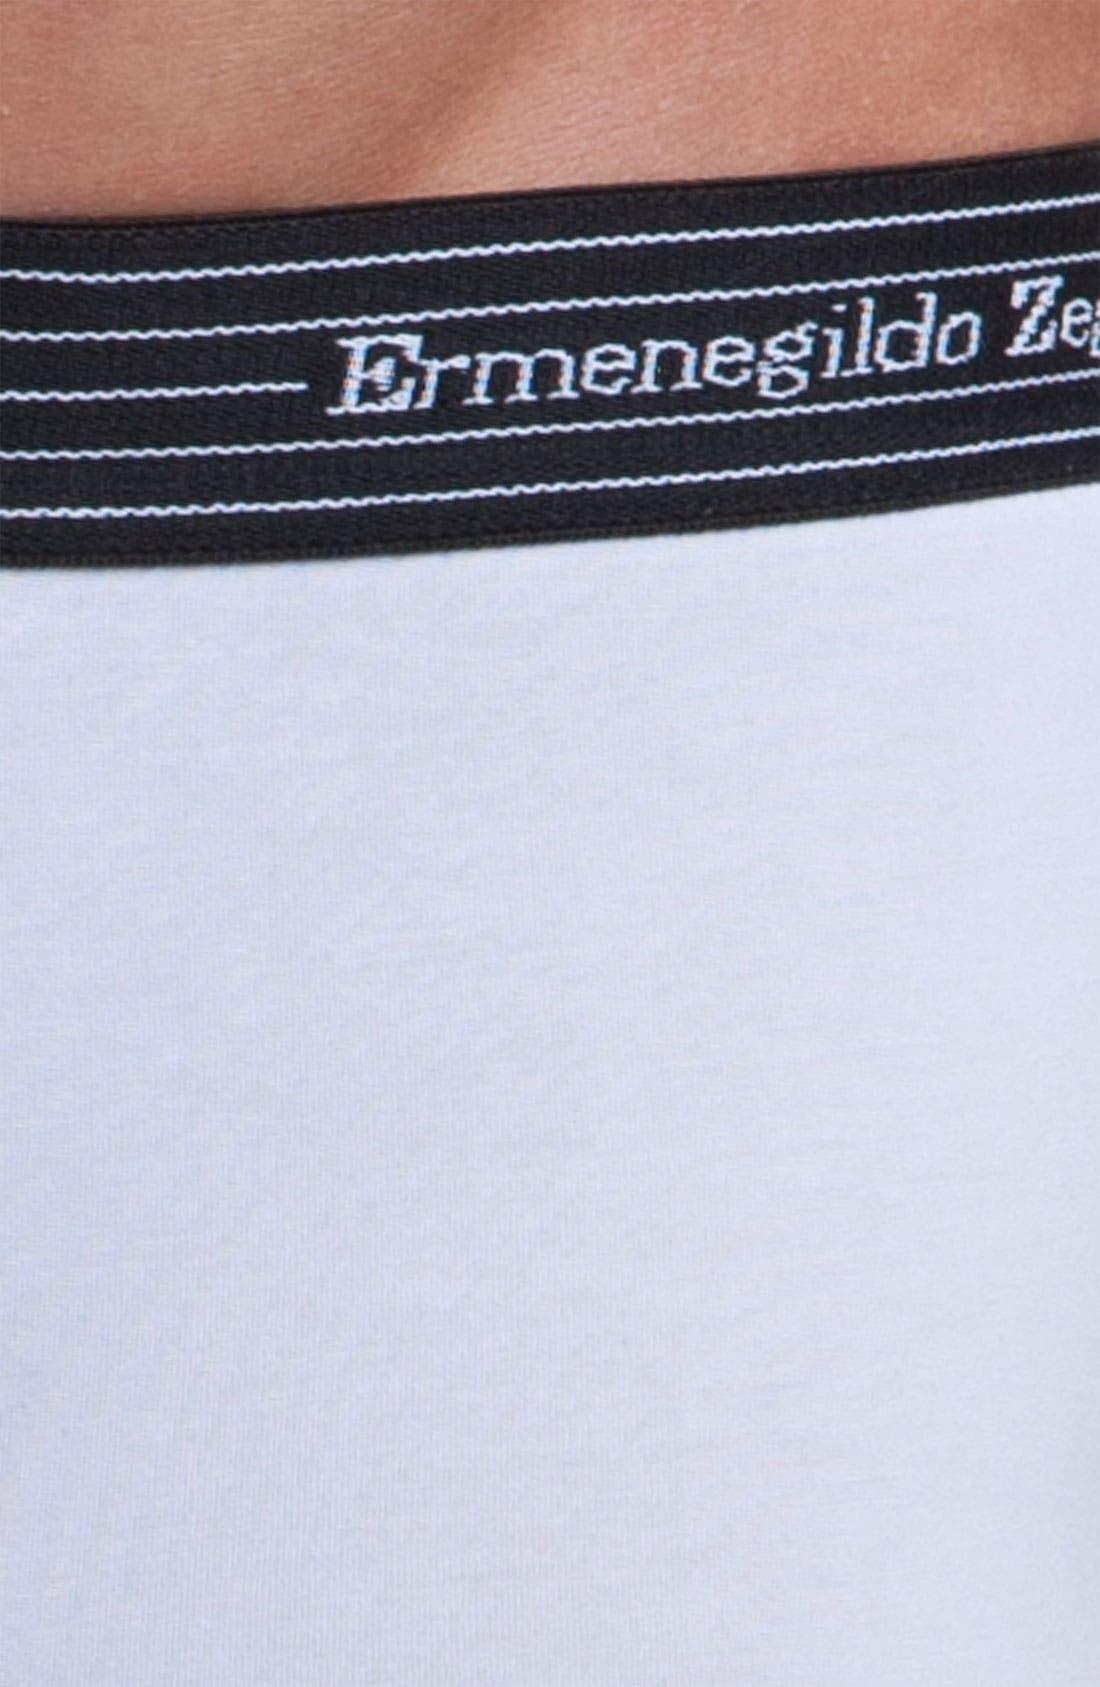 Alternate Image 2  - Ermenegildo Zegna Stretch Cotton Trunks